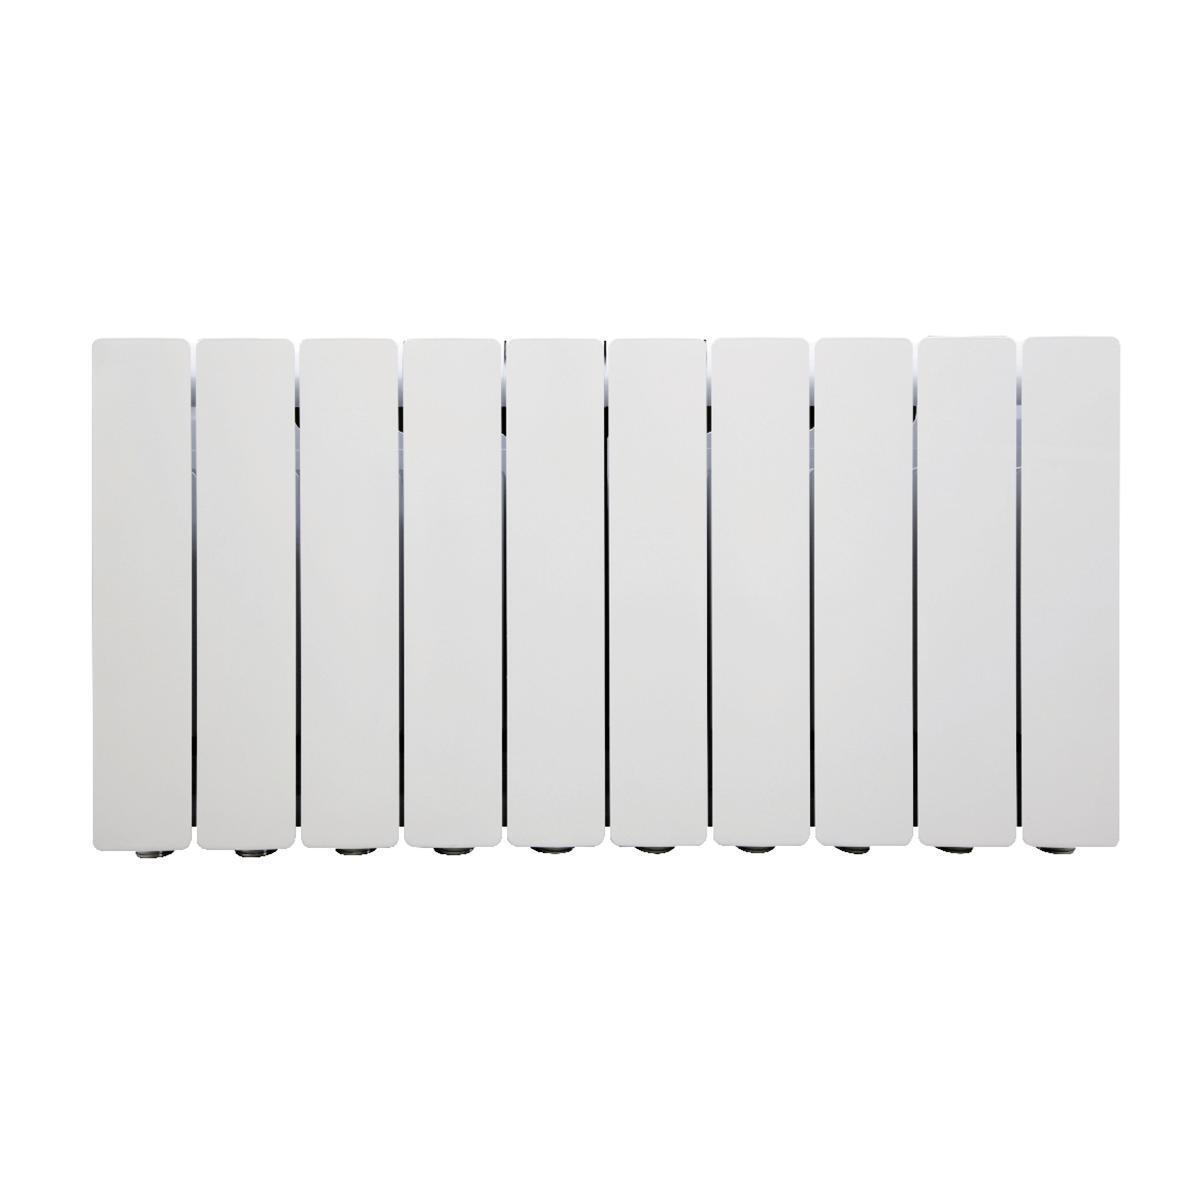 Radiatore acqua calda PRODIGE Modern in alluminio 10 elementi interasse 35 cm - 6